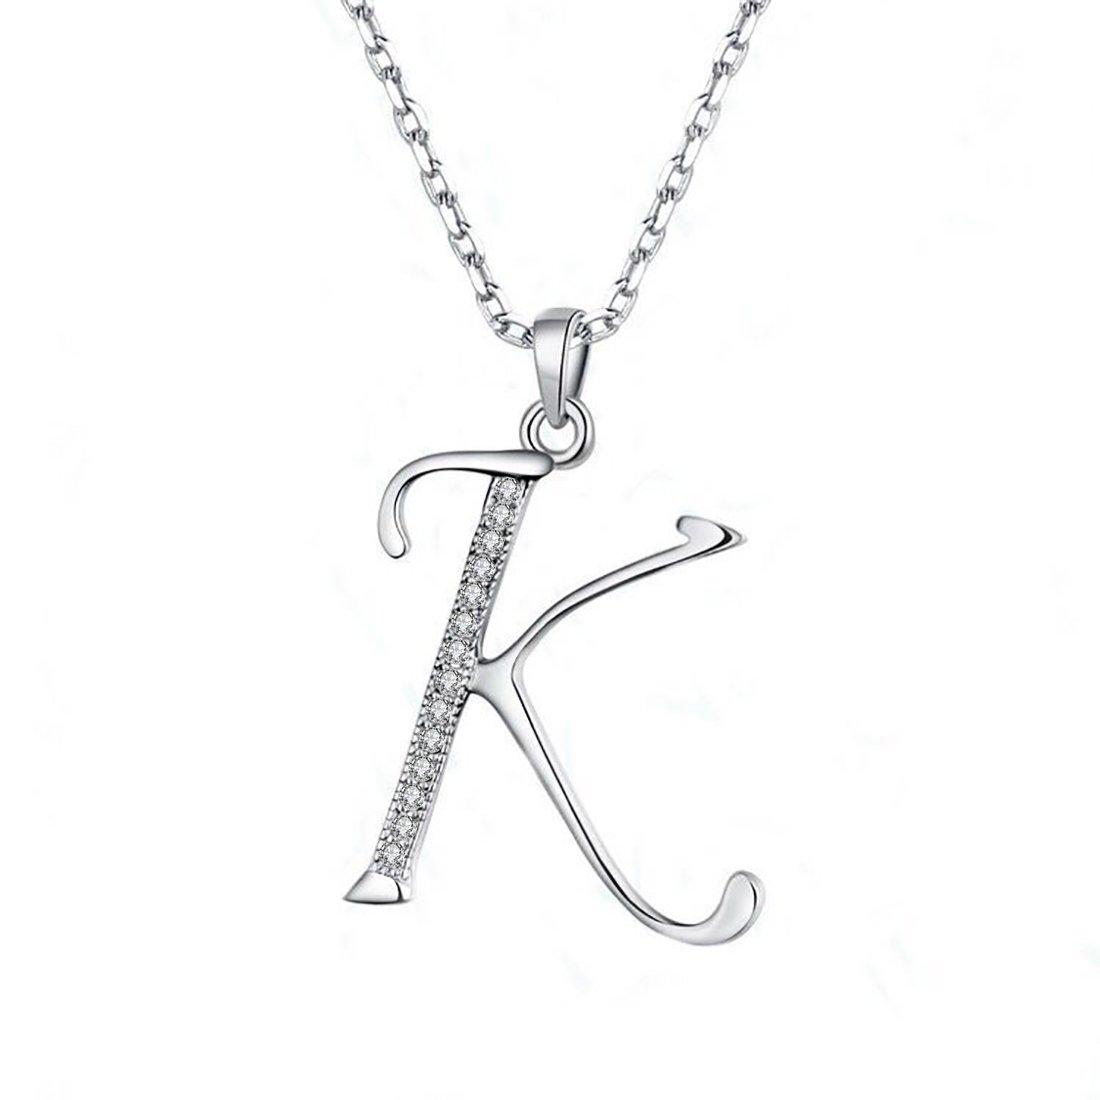 JUFU Fashion Jewelry 925 Sterling Silver 26 Alphabet Letter Pendant Necklace 18+2'' (Alphabe K)